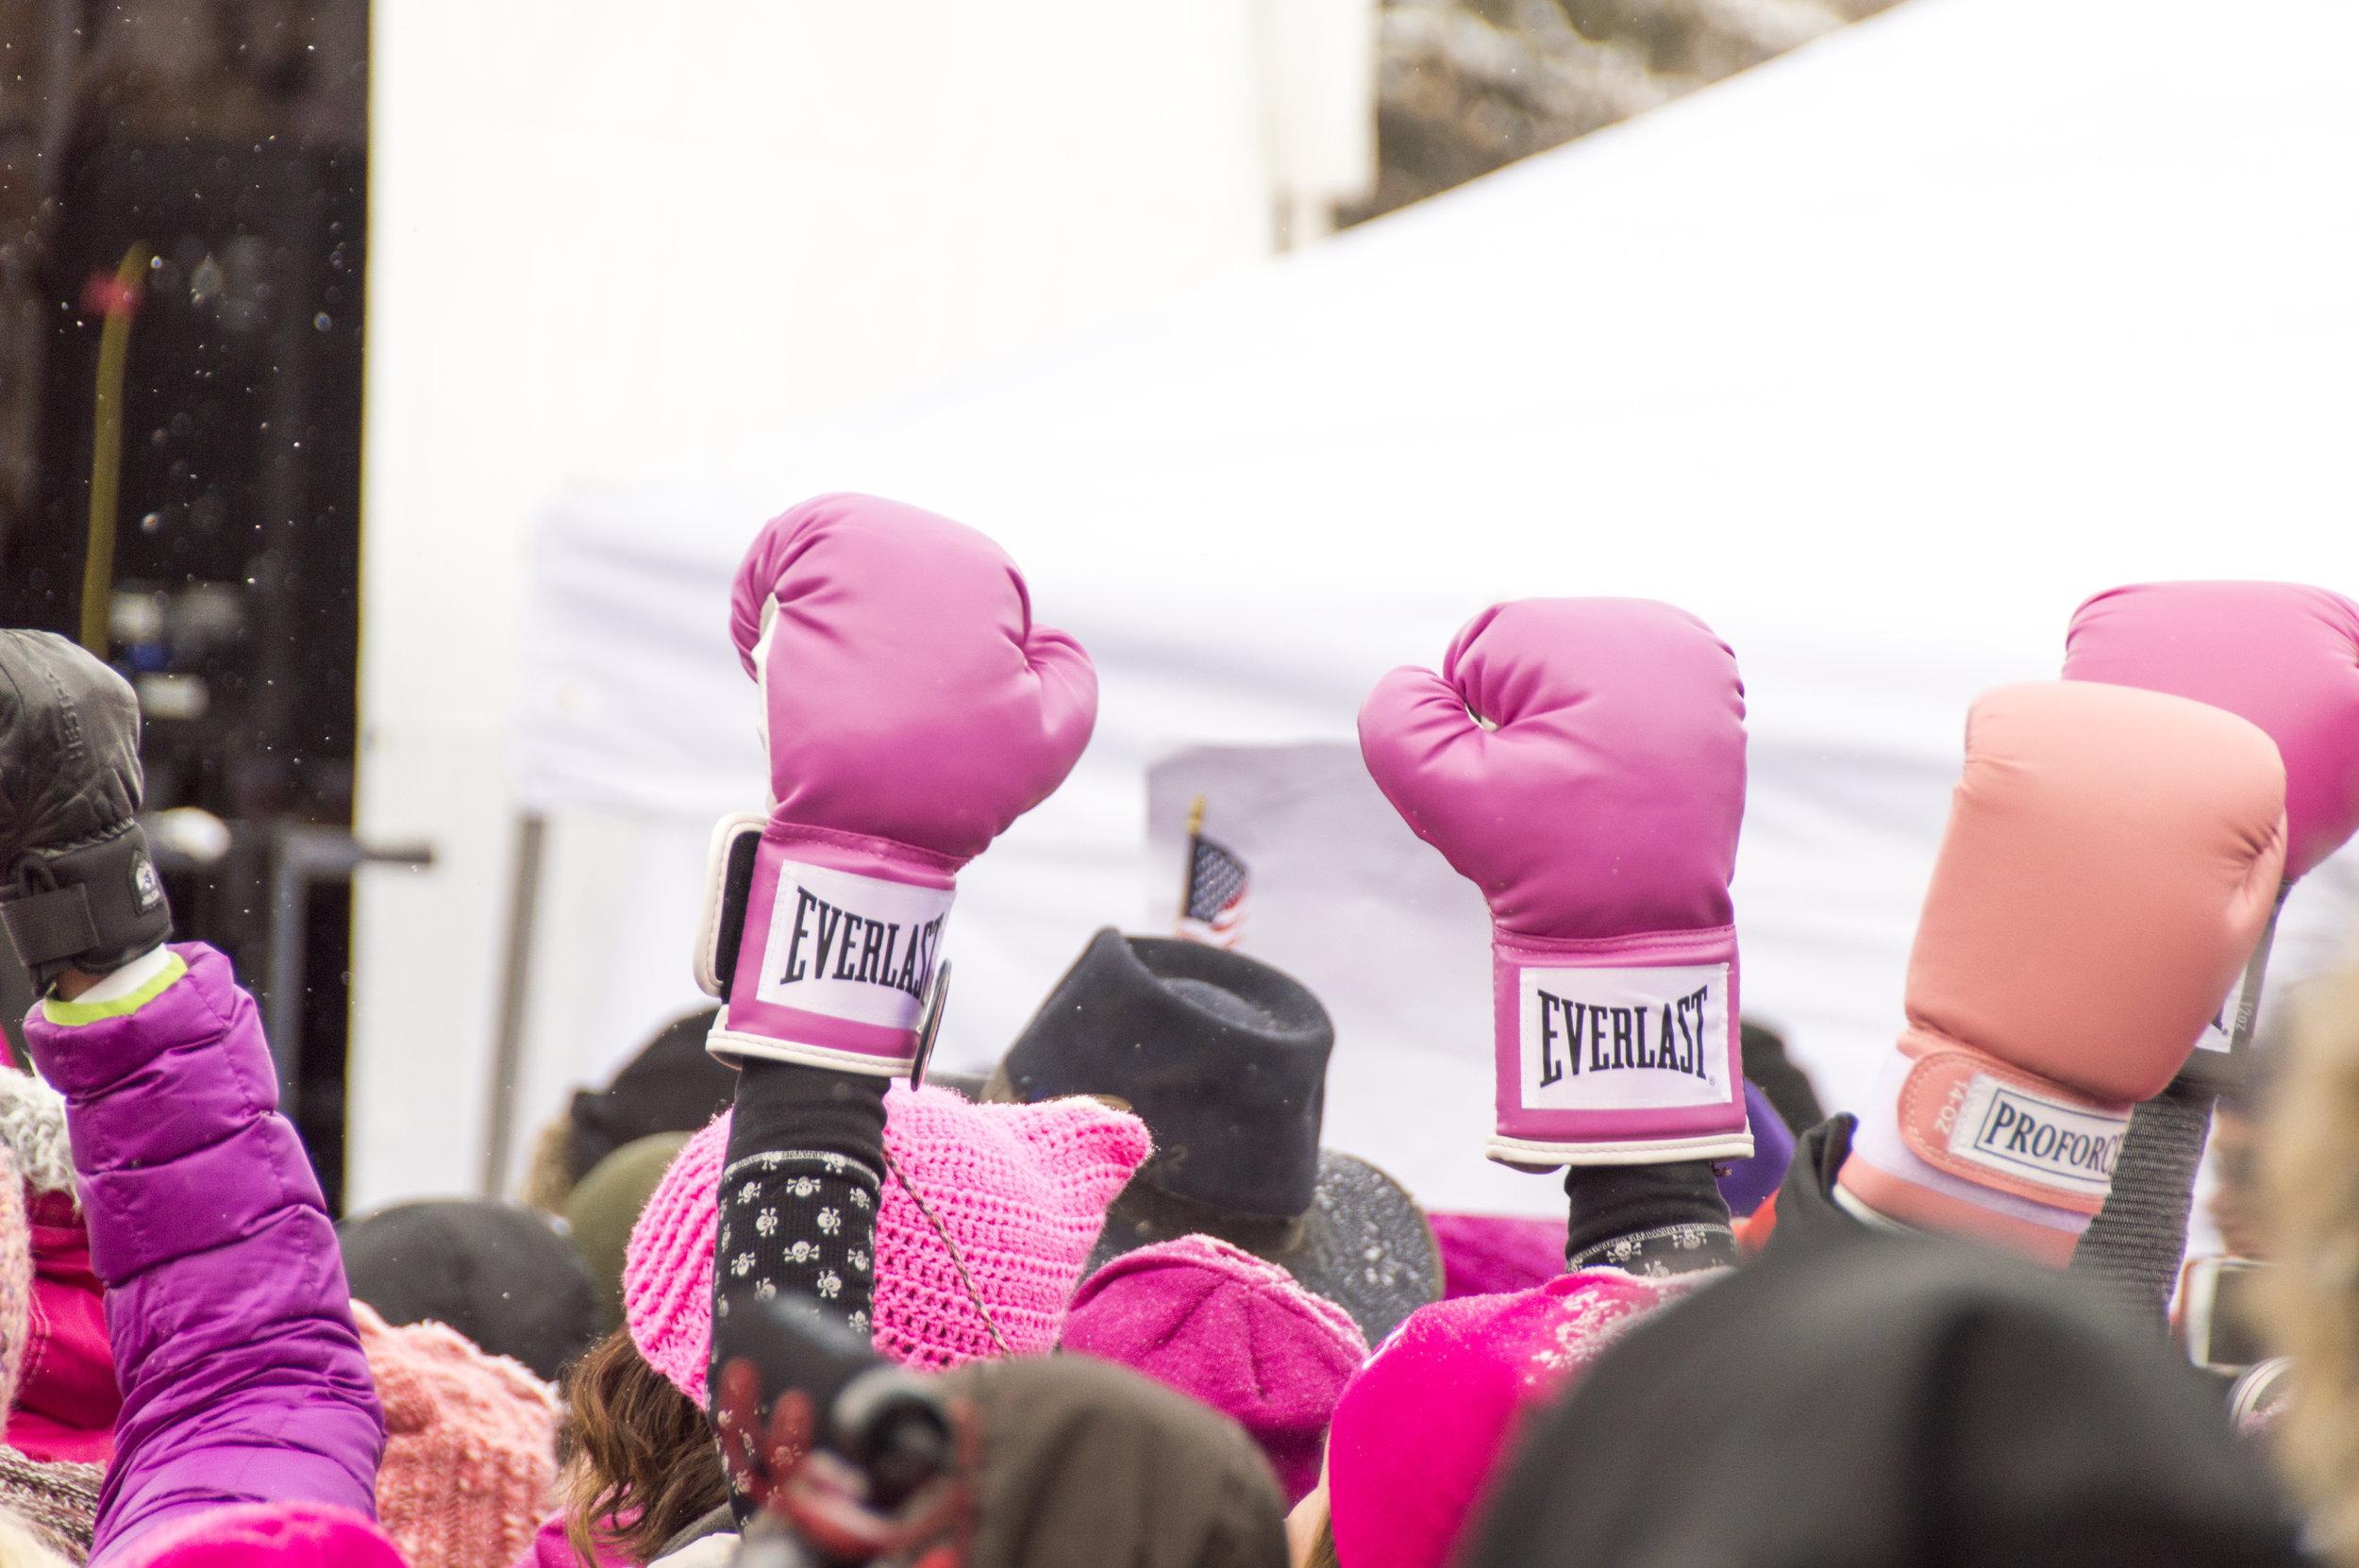 womens march_012117_gigi m kisela035.jpg